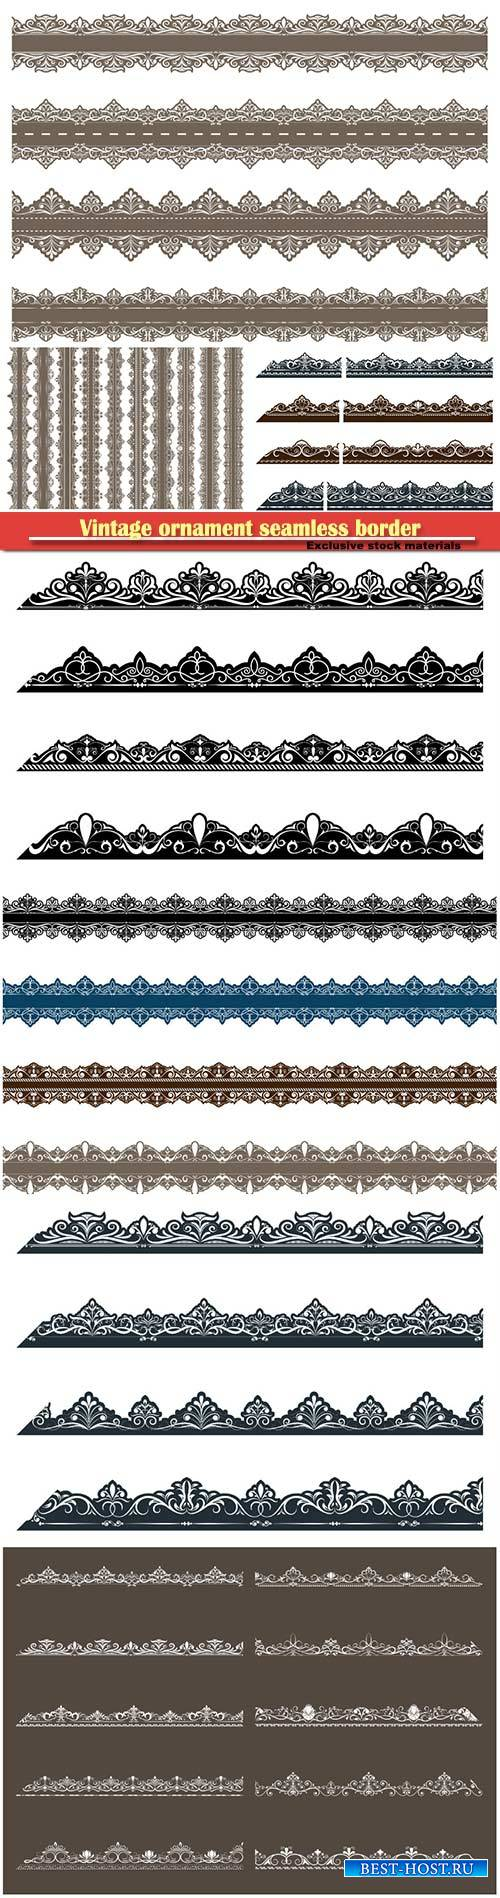 Vintage ornament seamless border in vector illustration